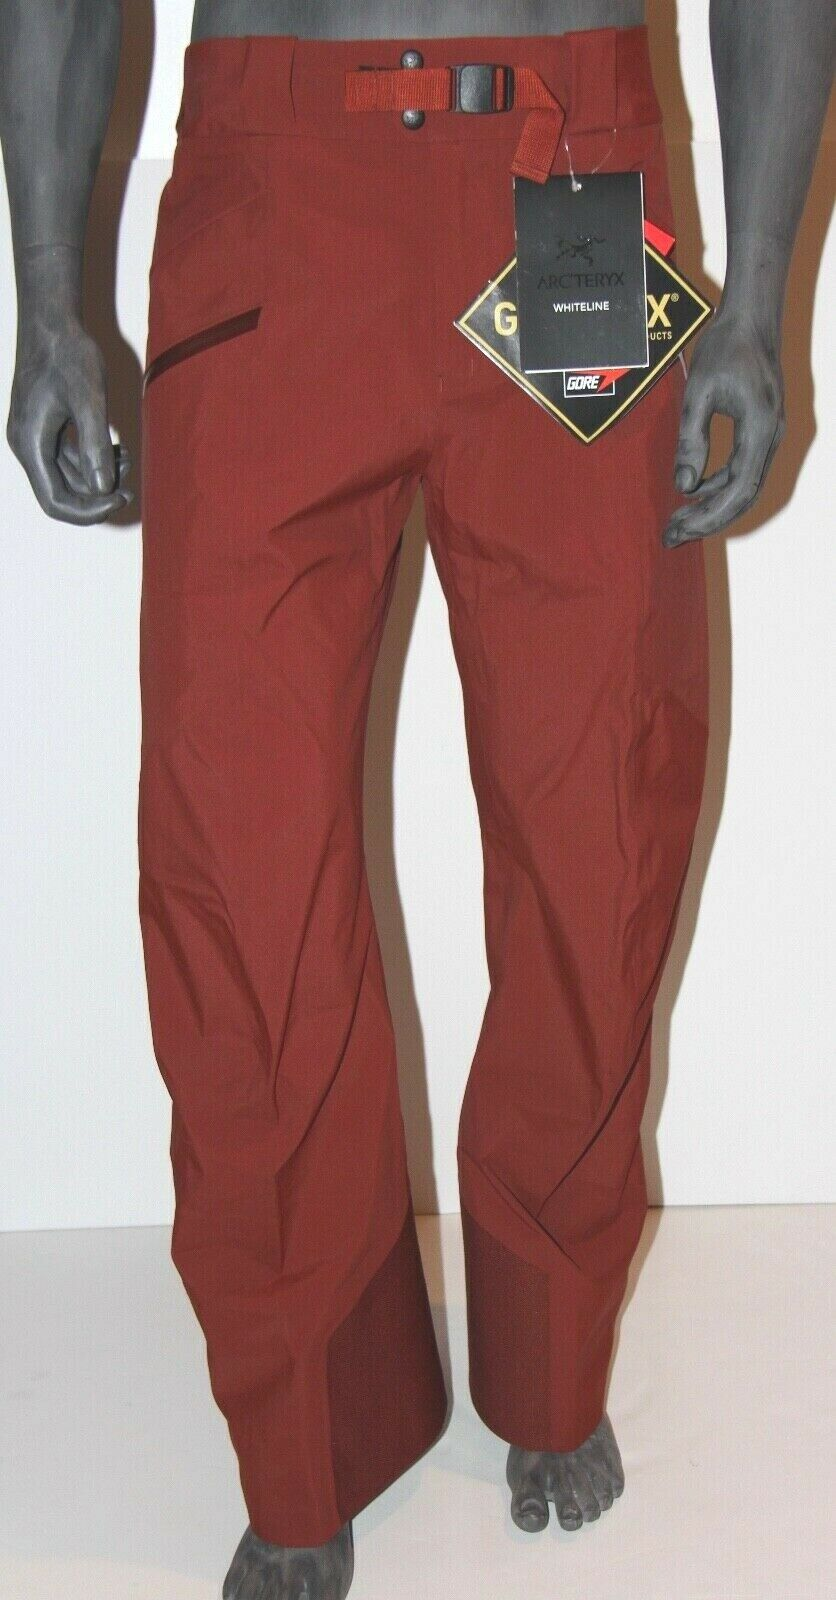 Arc'teryx Sabre Pant Men's Gore-Tex Ski Snowboard Large L G  Reg - Pompeii - NEW  cheap store